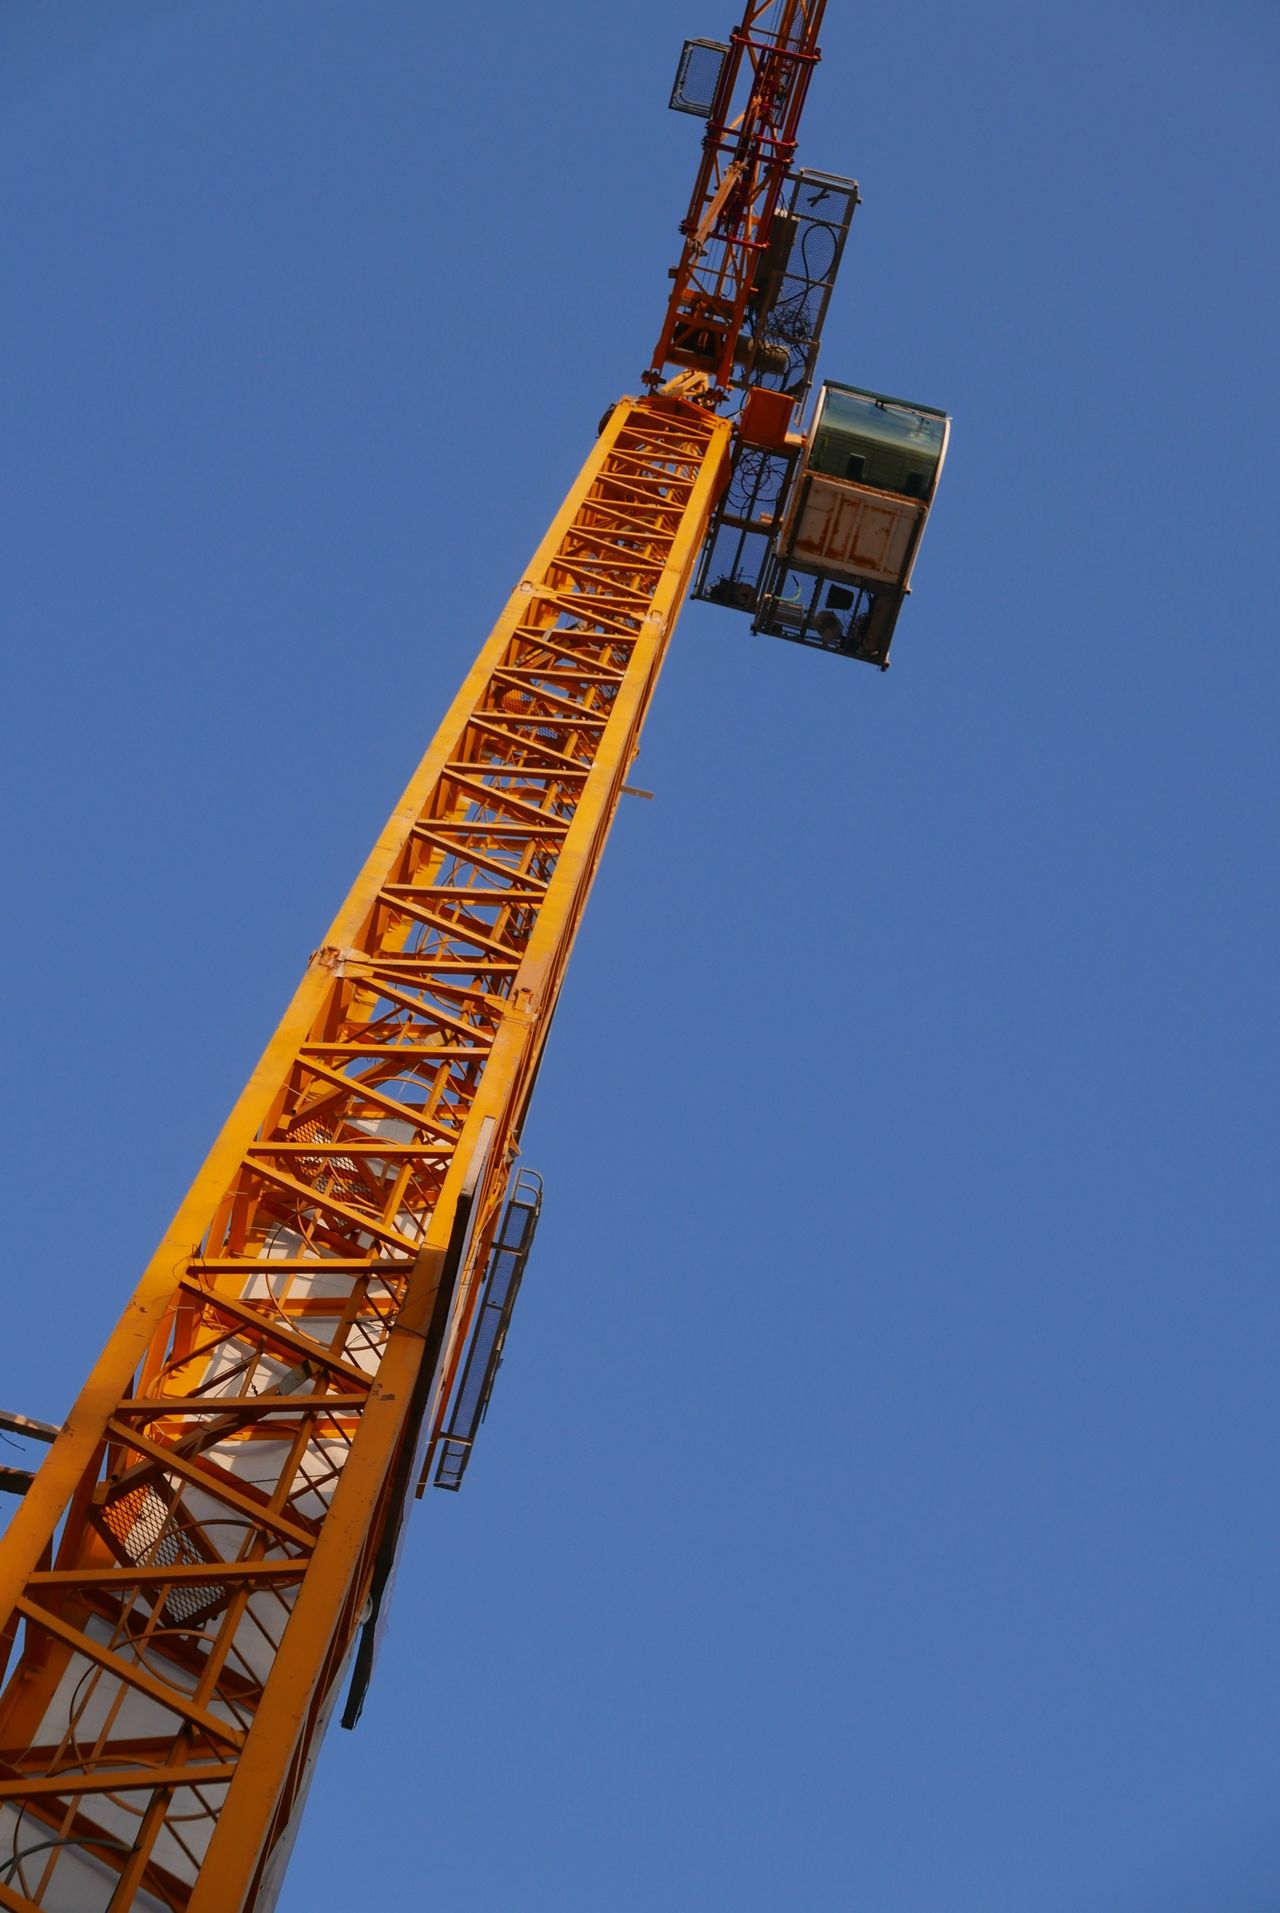 Construction crane against blue sky at dusk Crane Construction Construction Crane Blue Sky